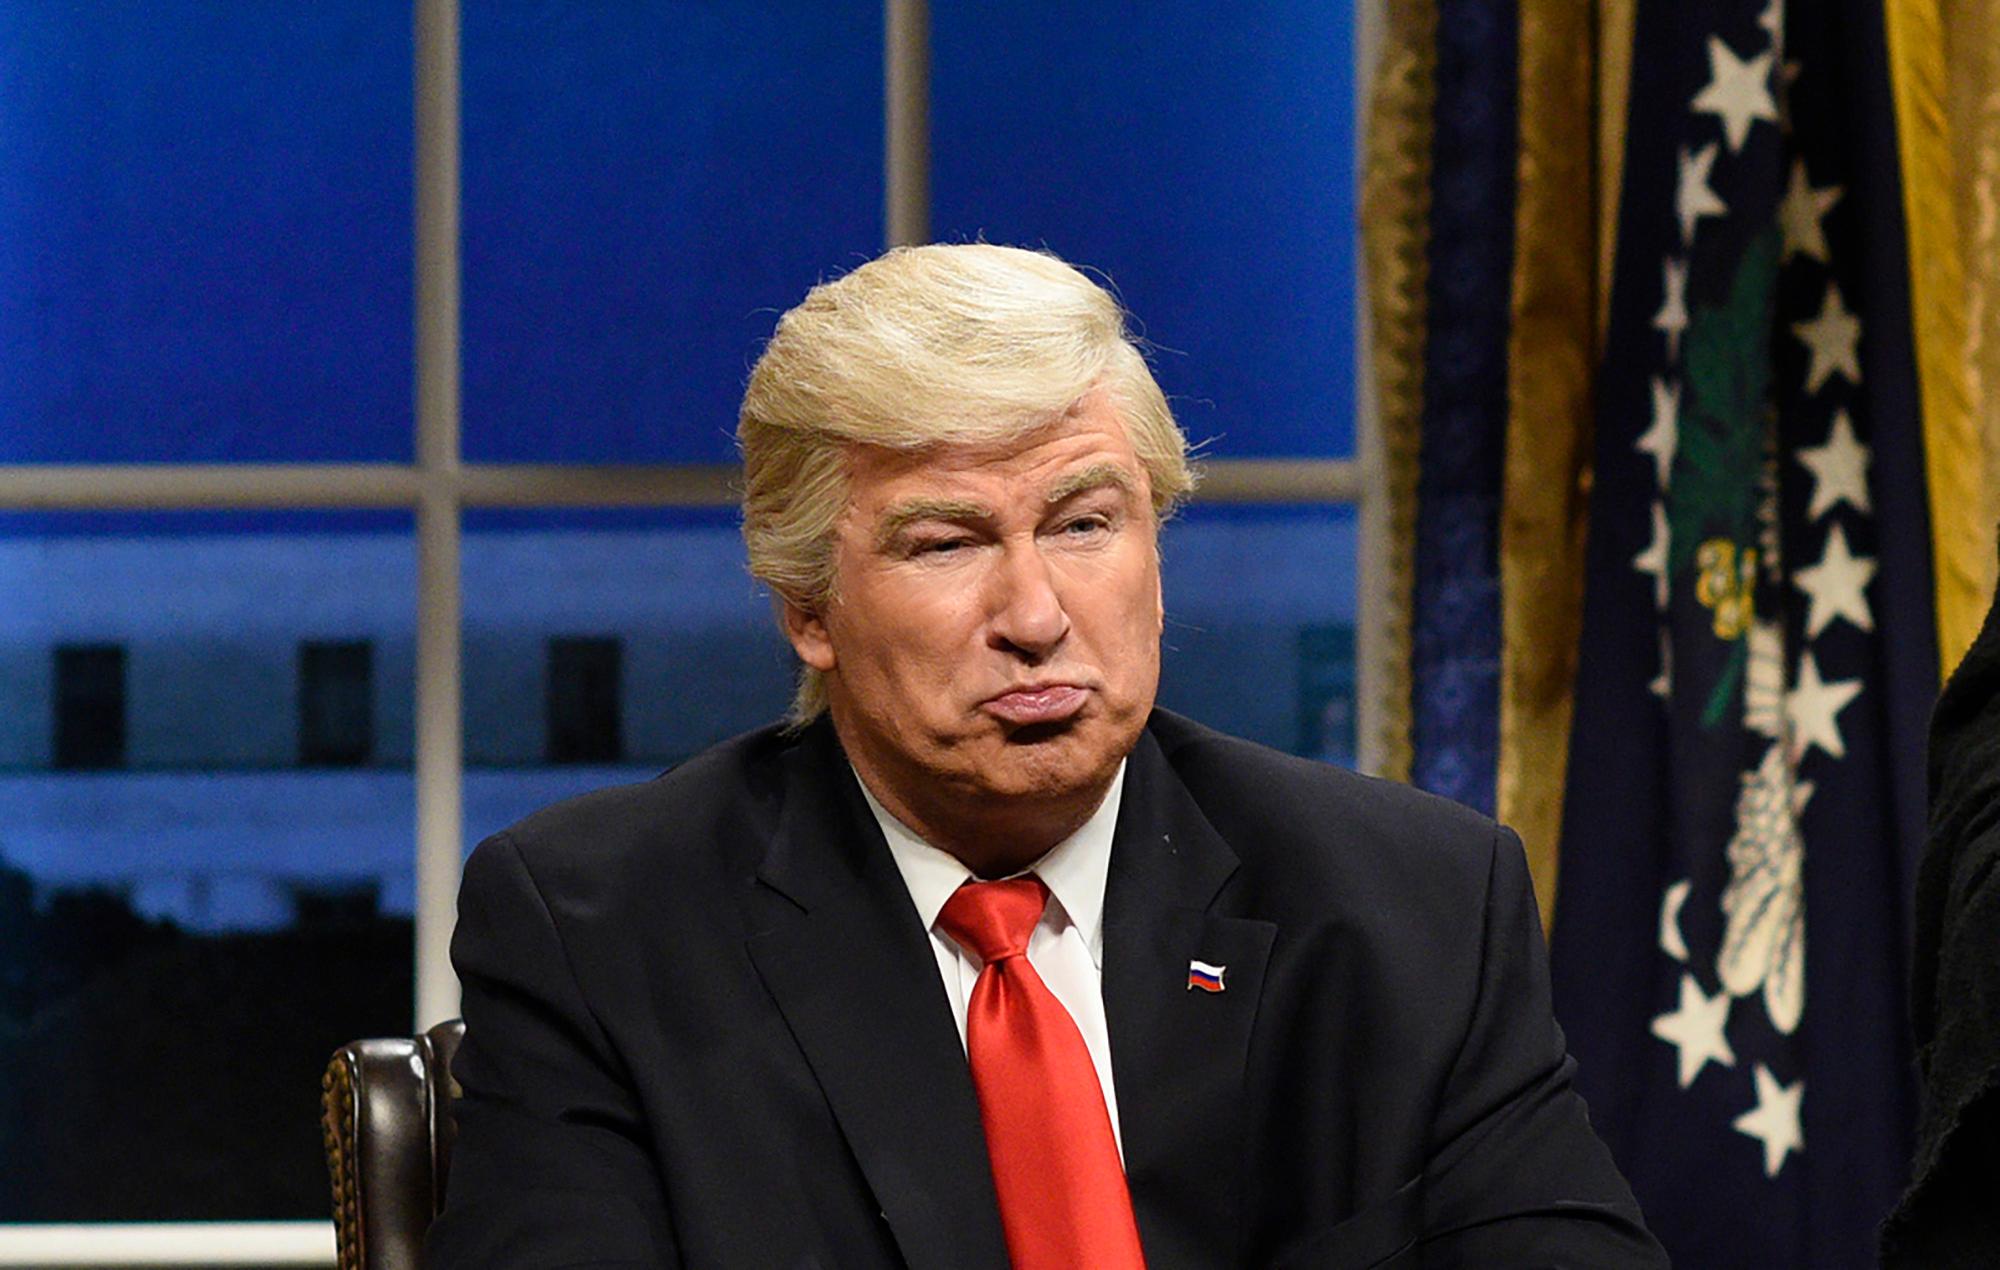 Trump biopic